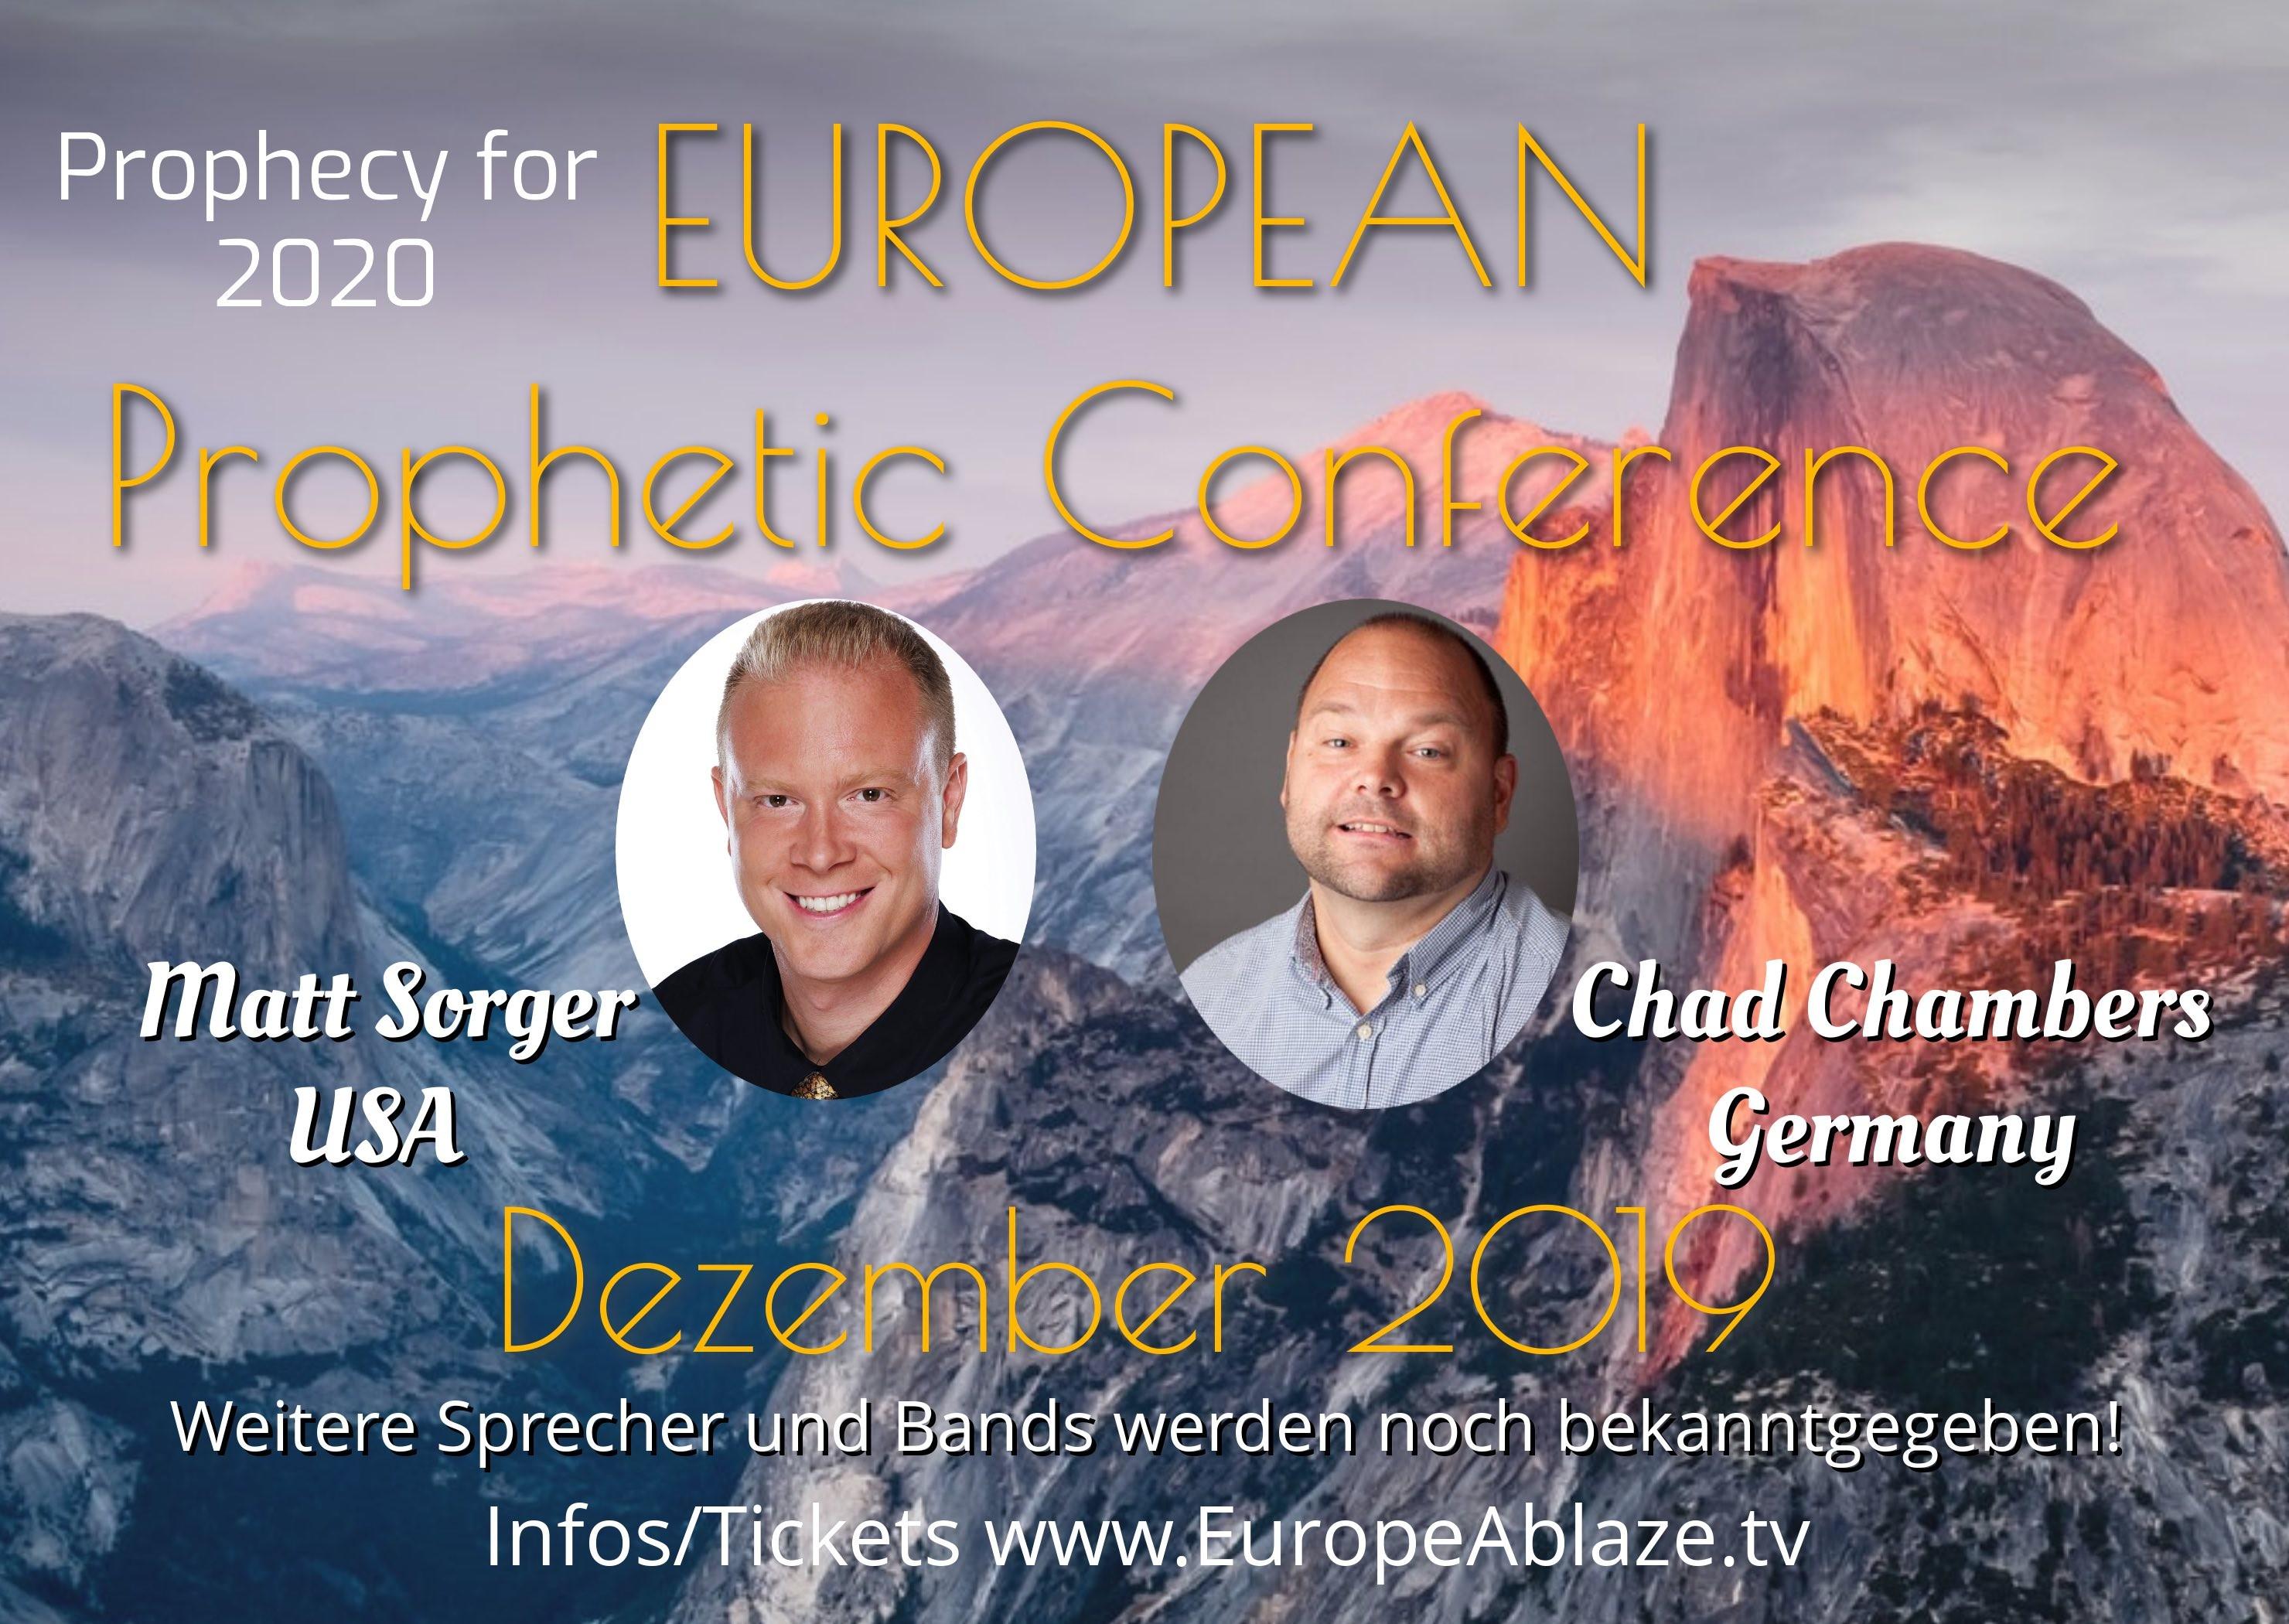 European Prophetic Conference 2020!